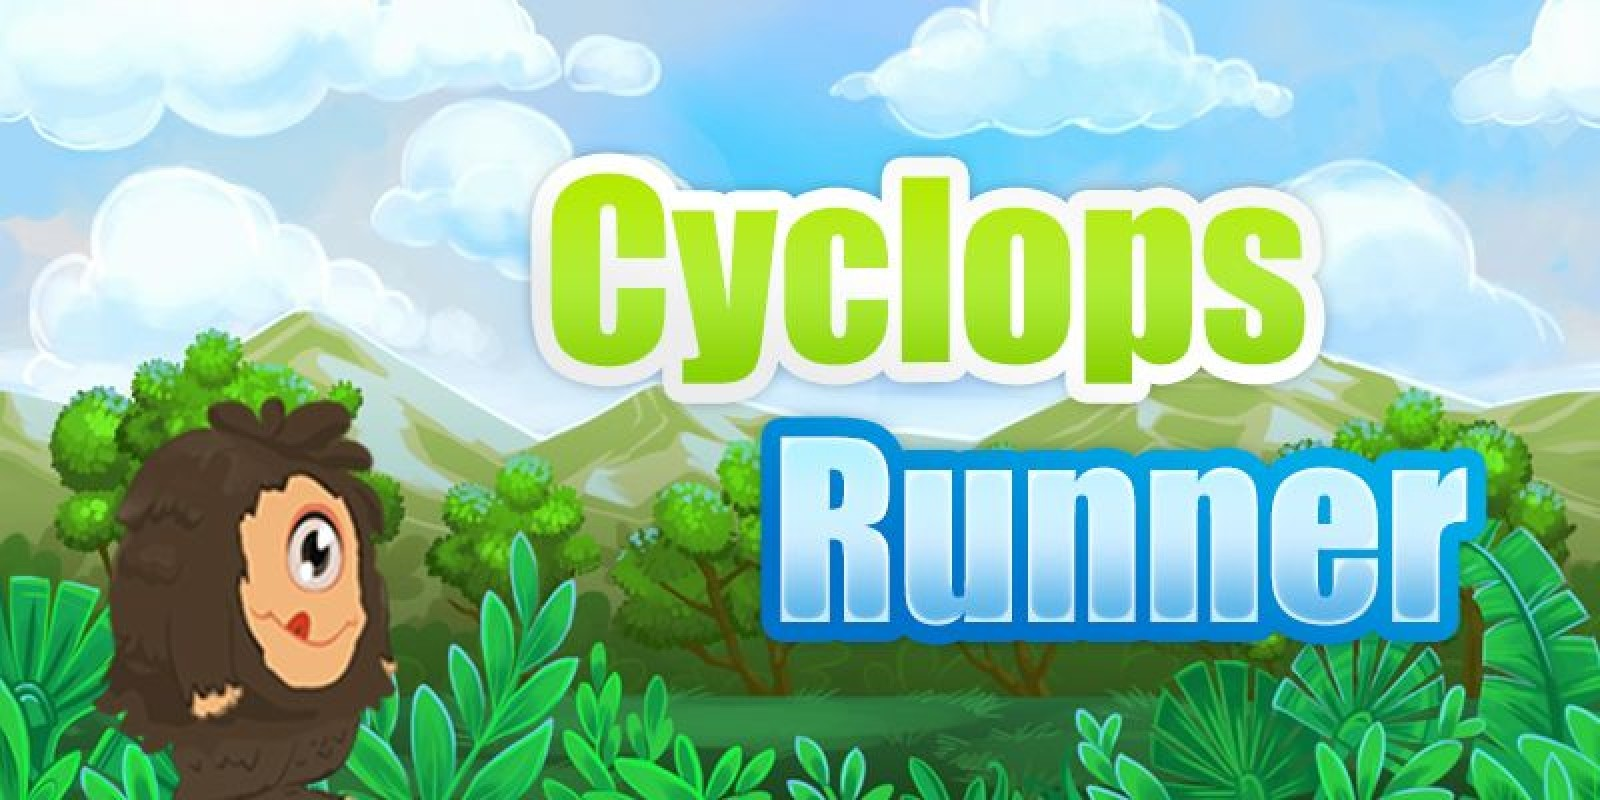 Cyclops runner iOS Game Source Code